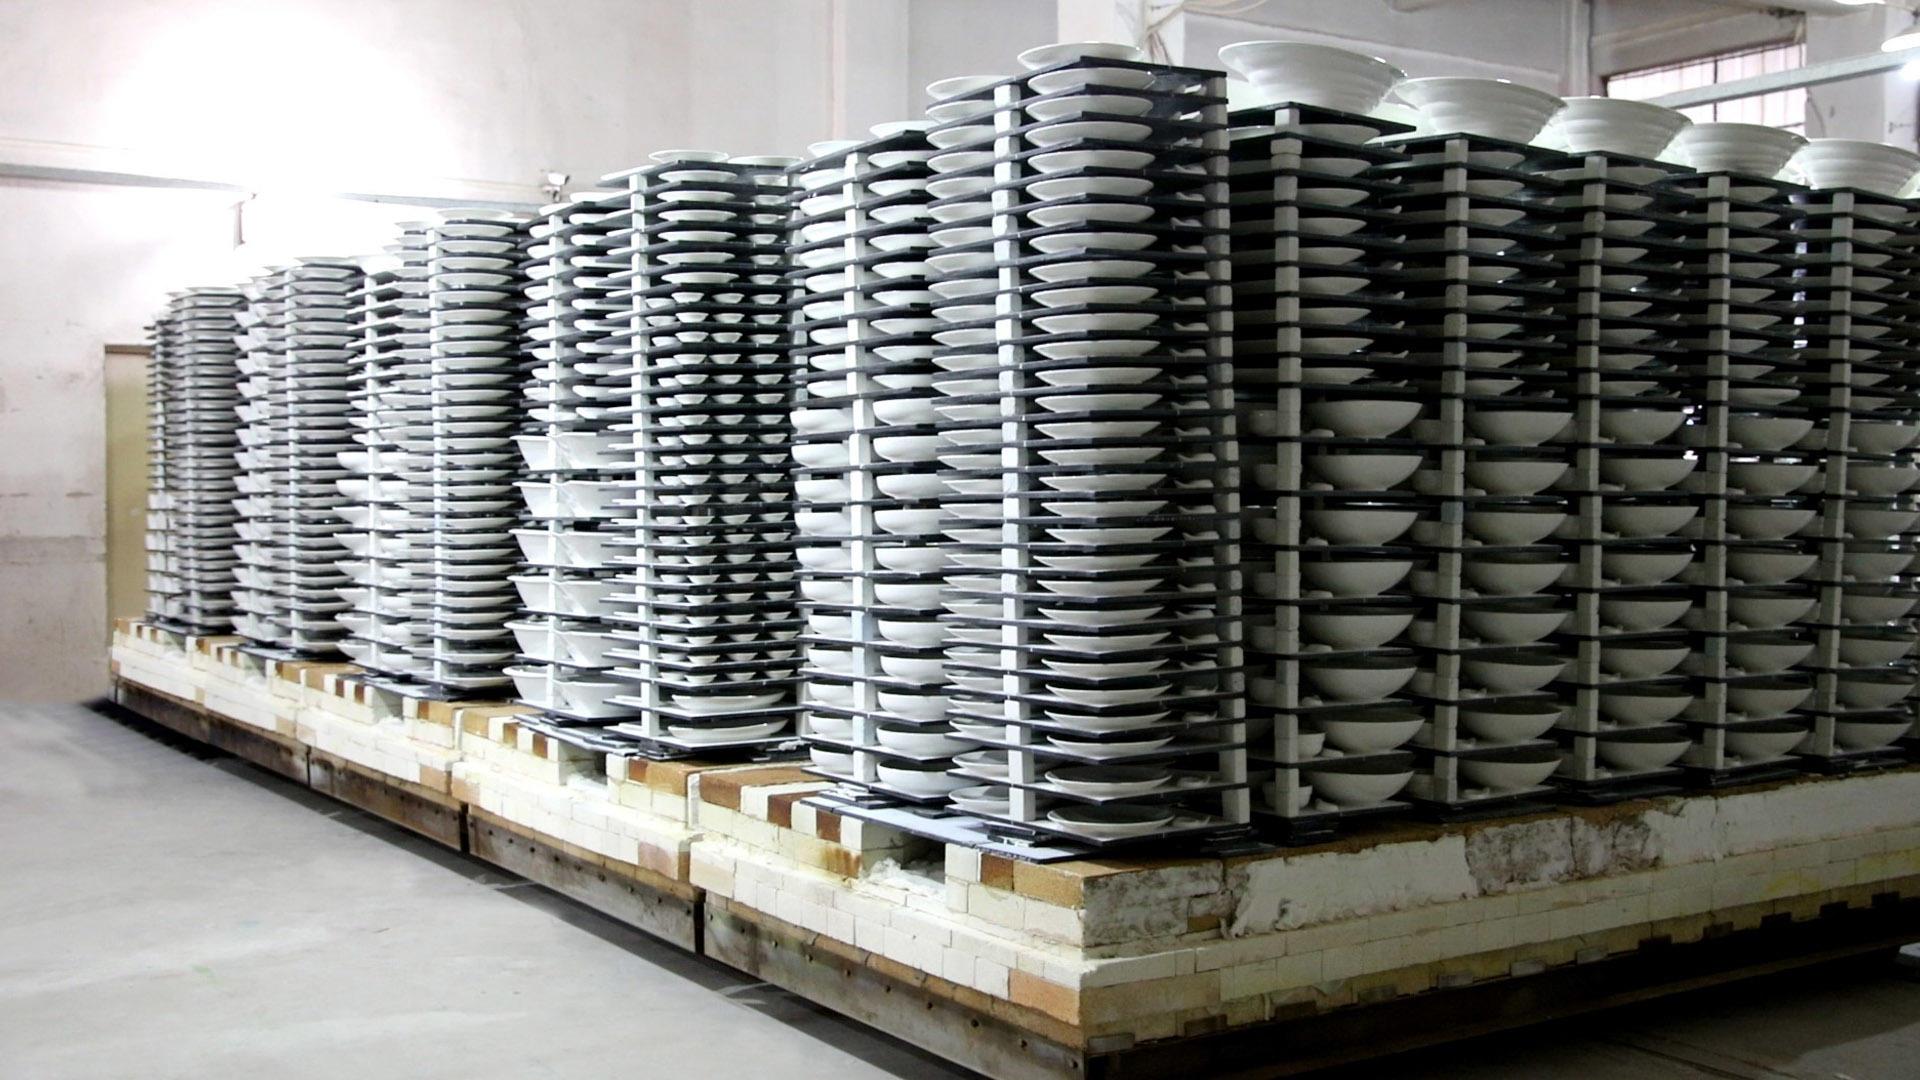 Ceramic factory: a car kiln can burn thousands of ceramic wares